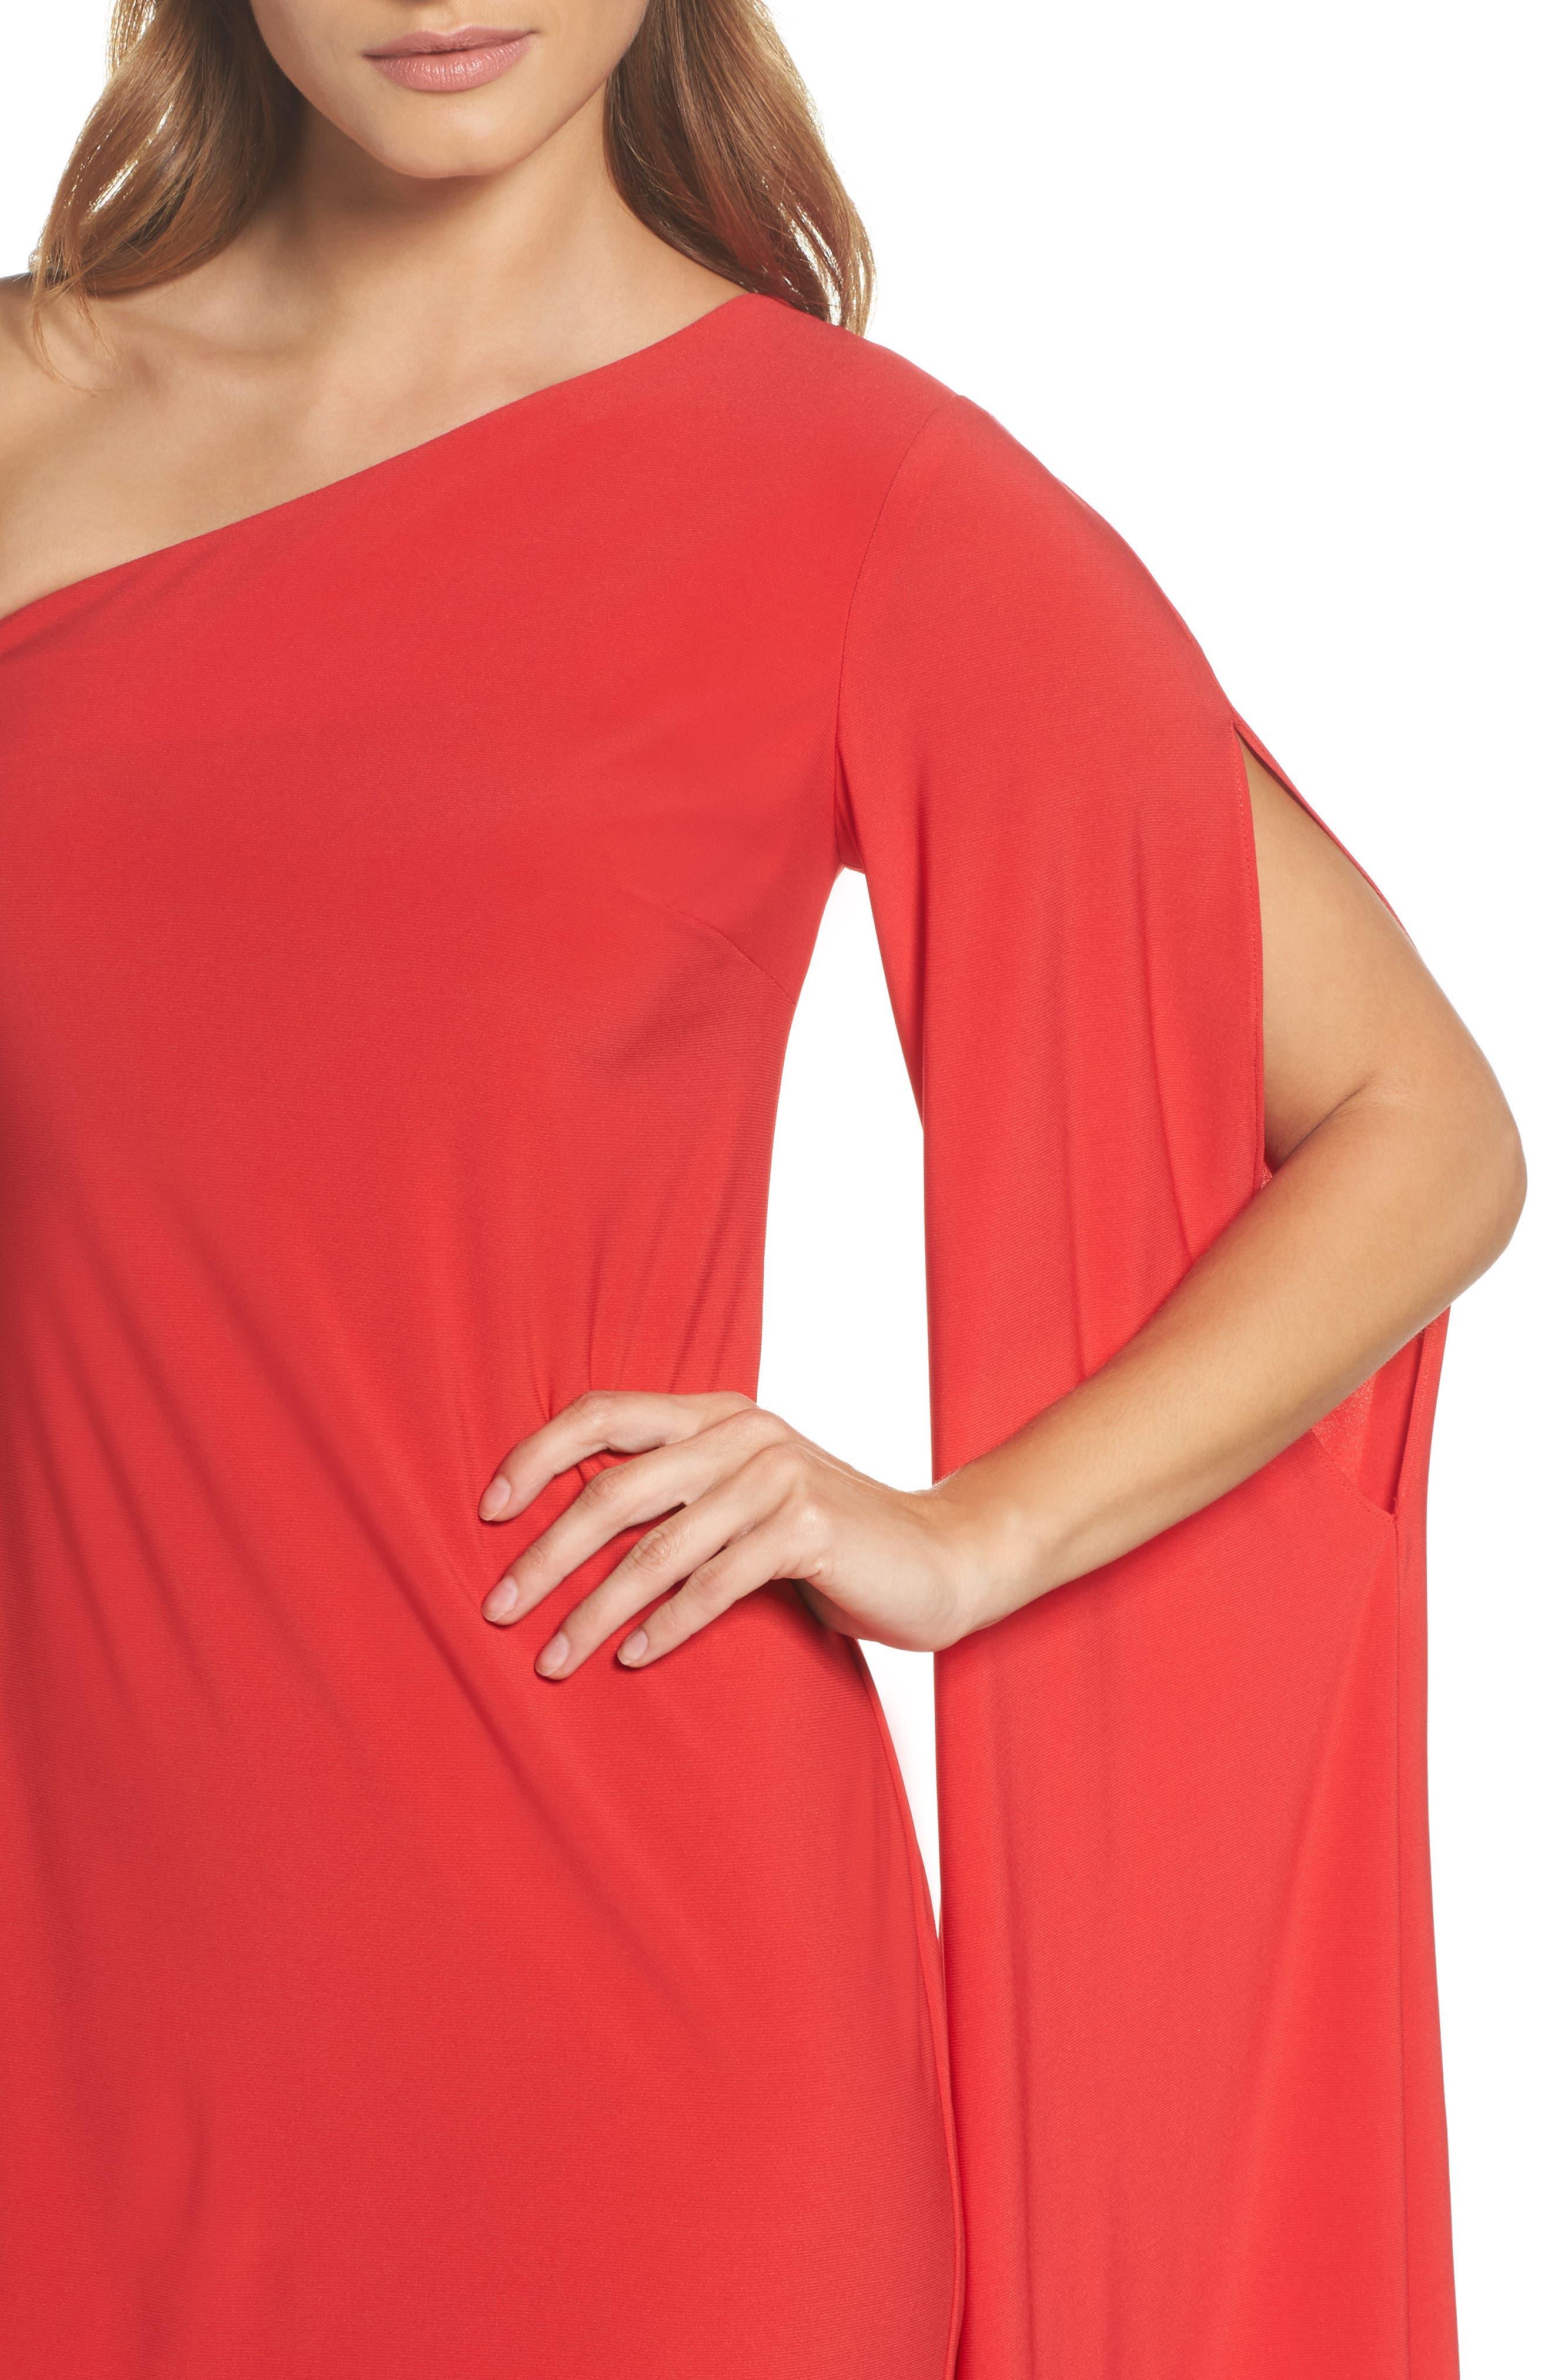 Musa One-Shoulder Dress,                             Alternate thumbnail 4, color,